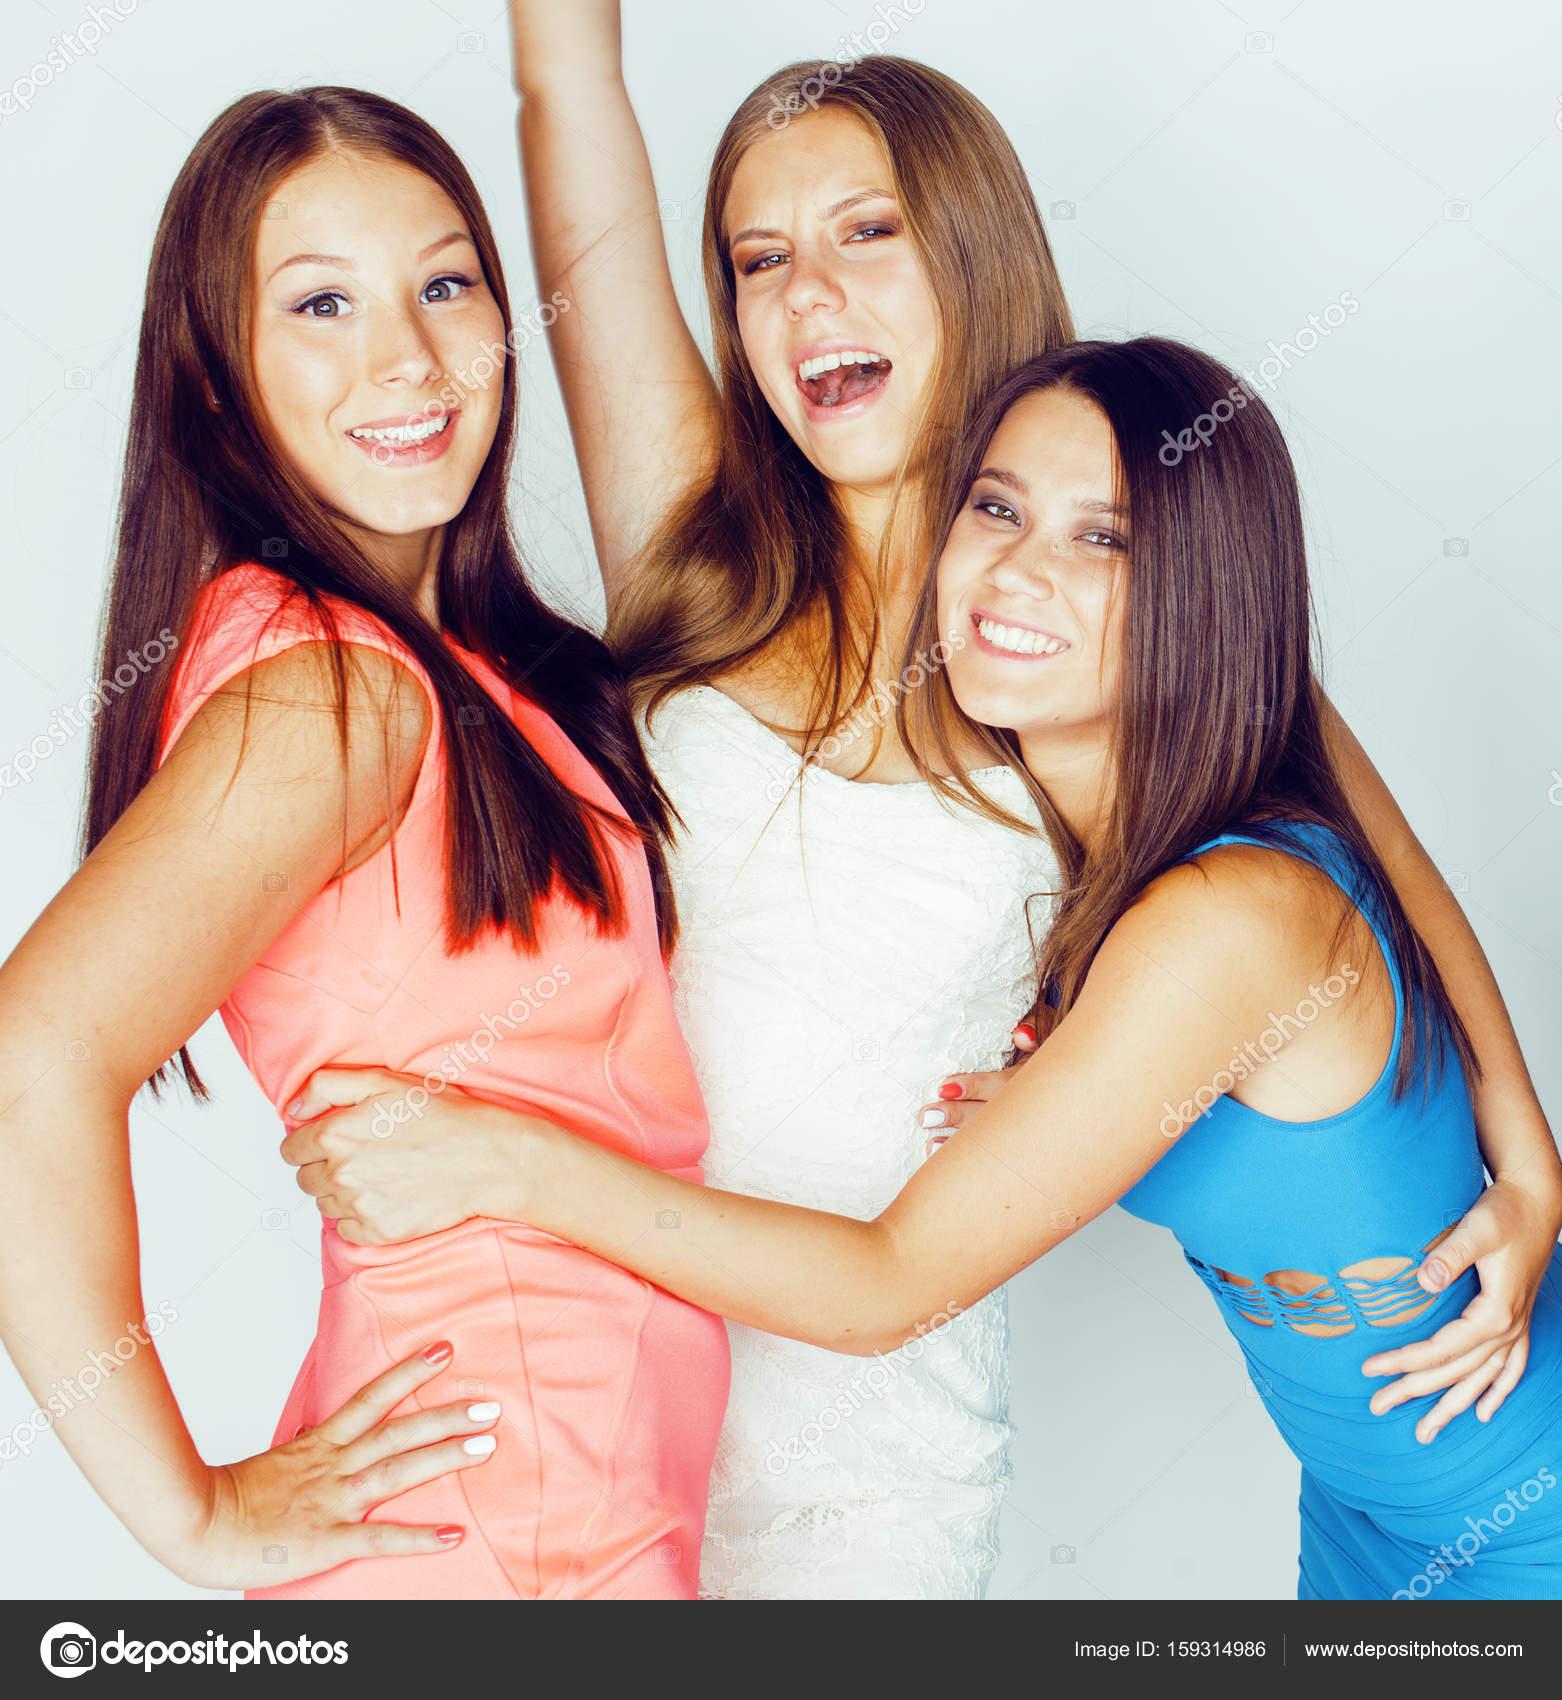 Много девушек вместе фото